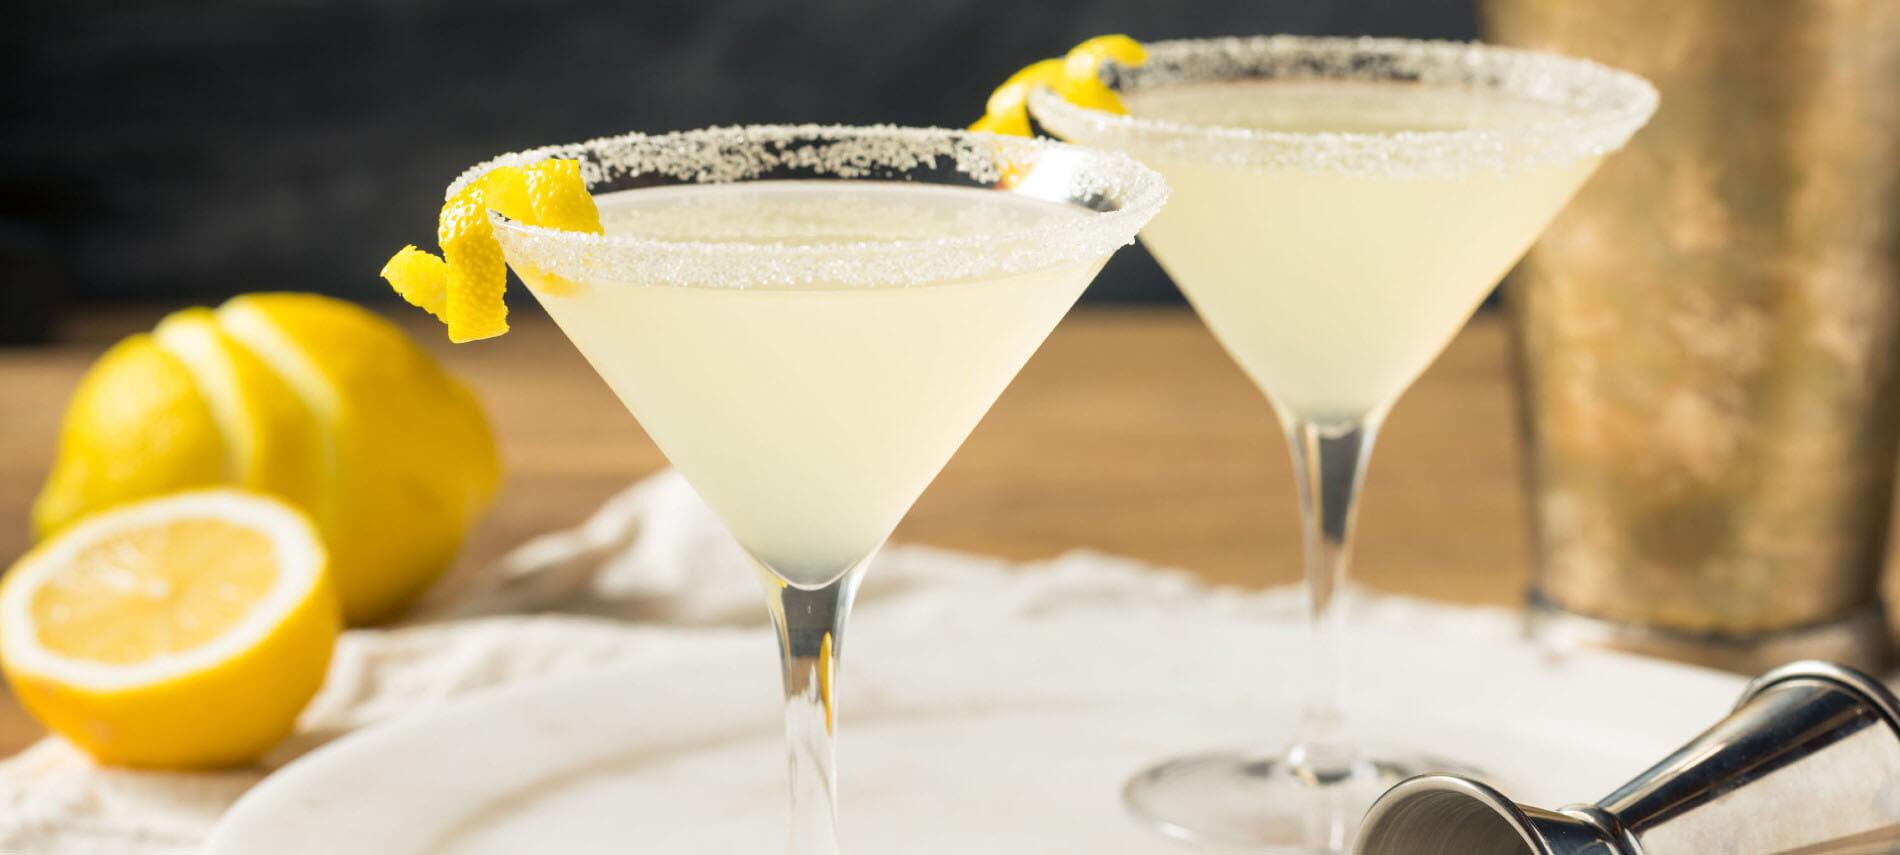 Yellow lemon Martini in clear glasses with lemons